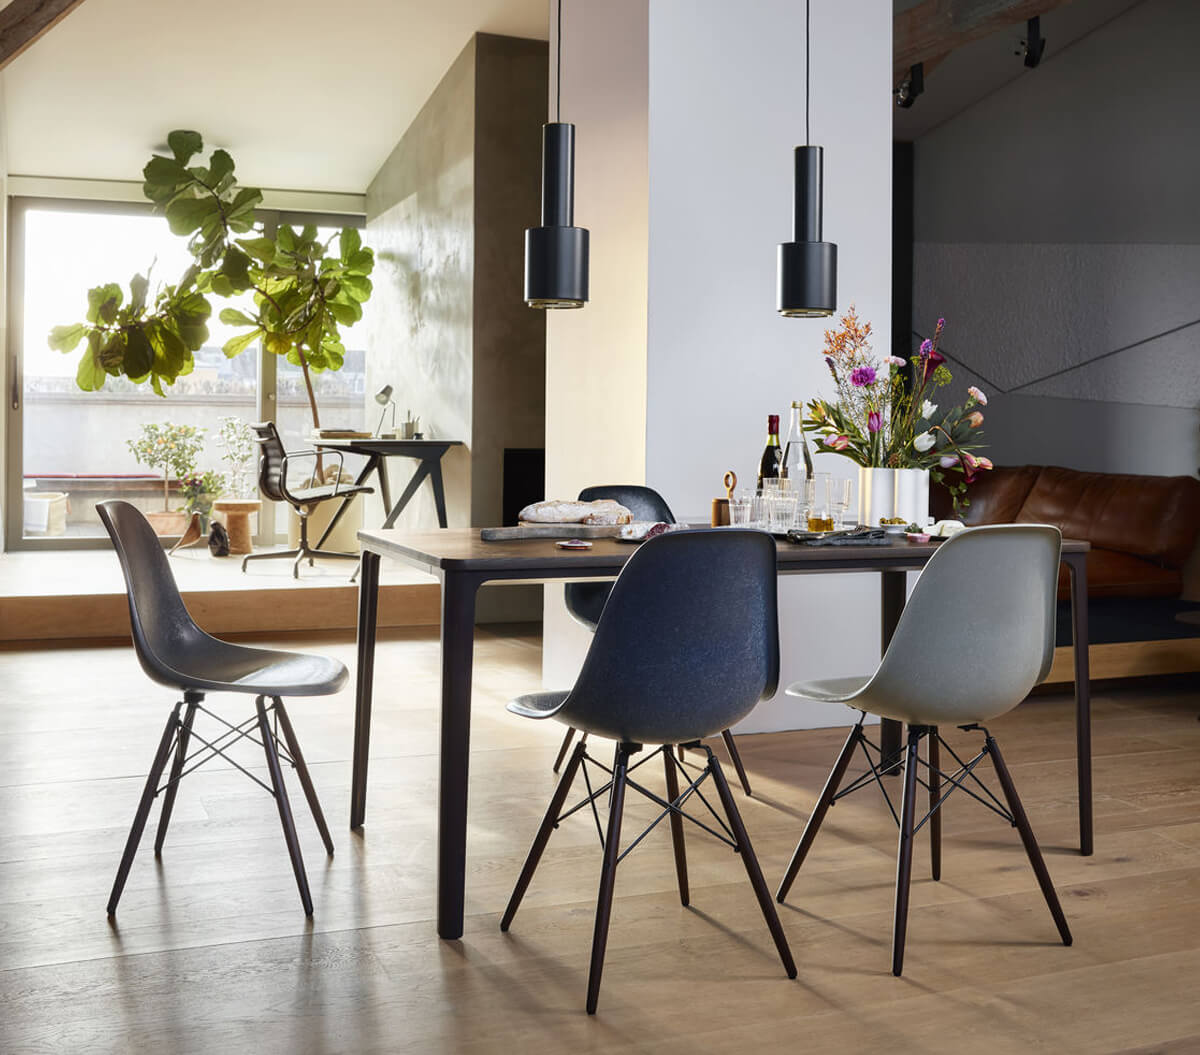 New Vitra Eames Fiberglass DSW chairs